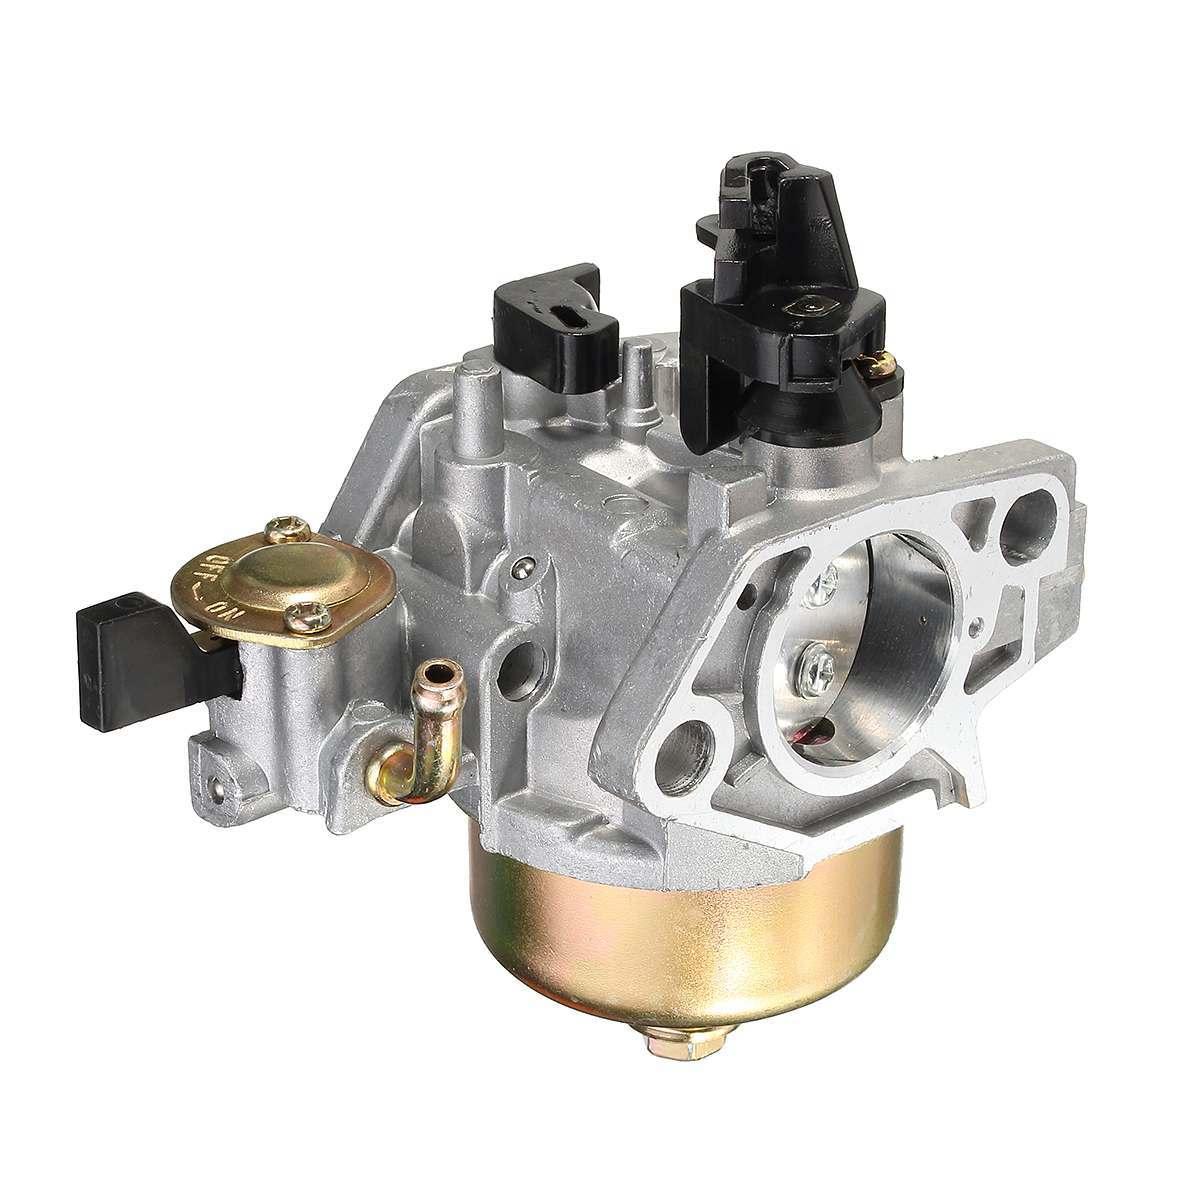 Honda gx390 carburetor